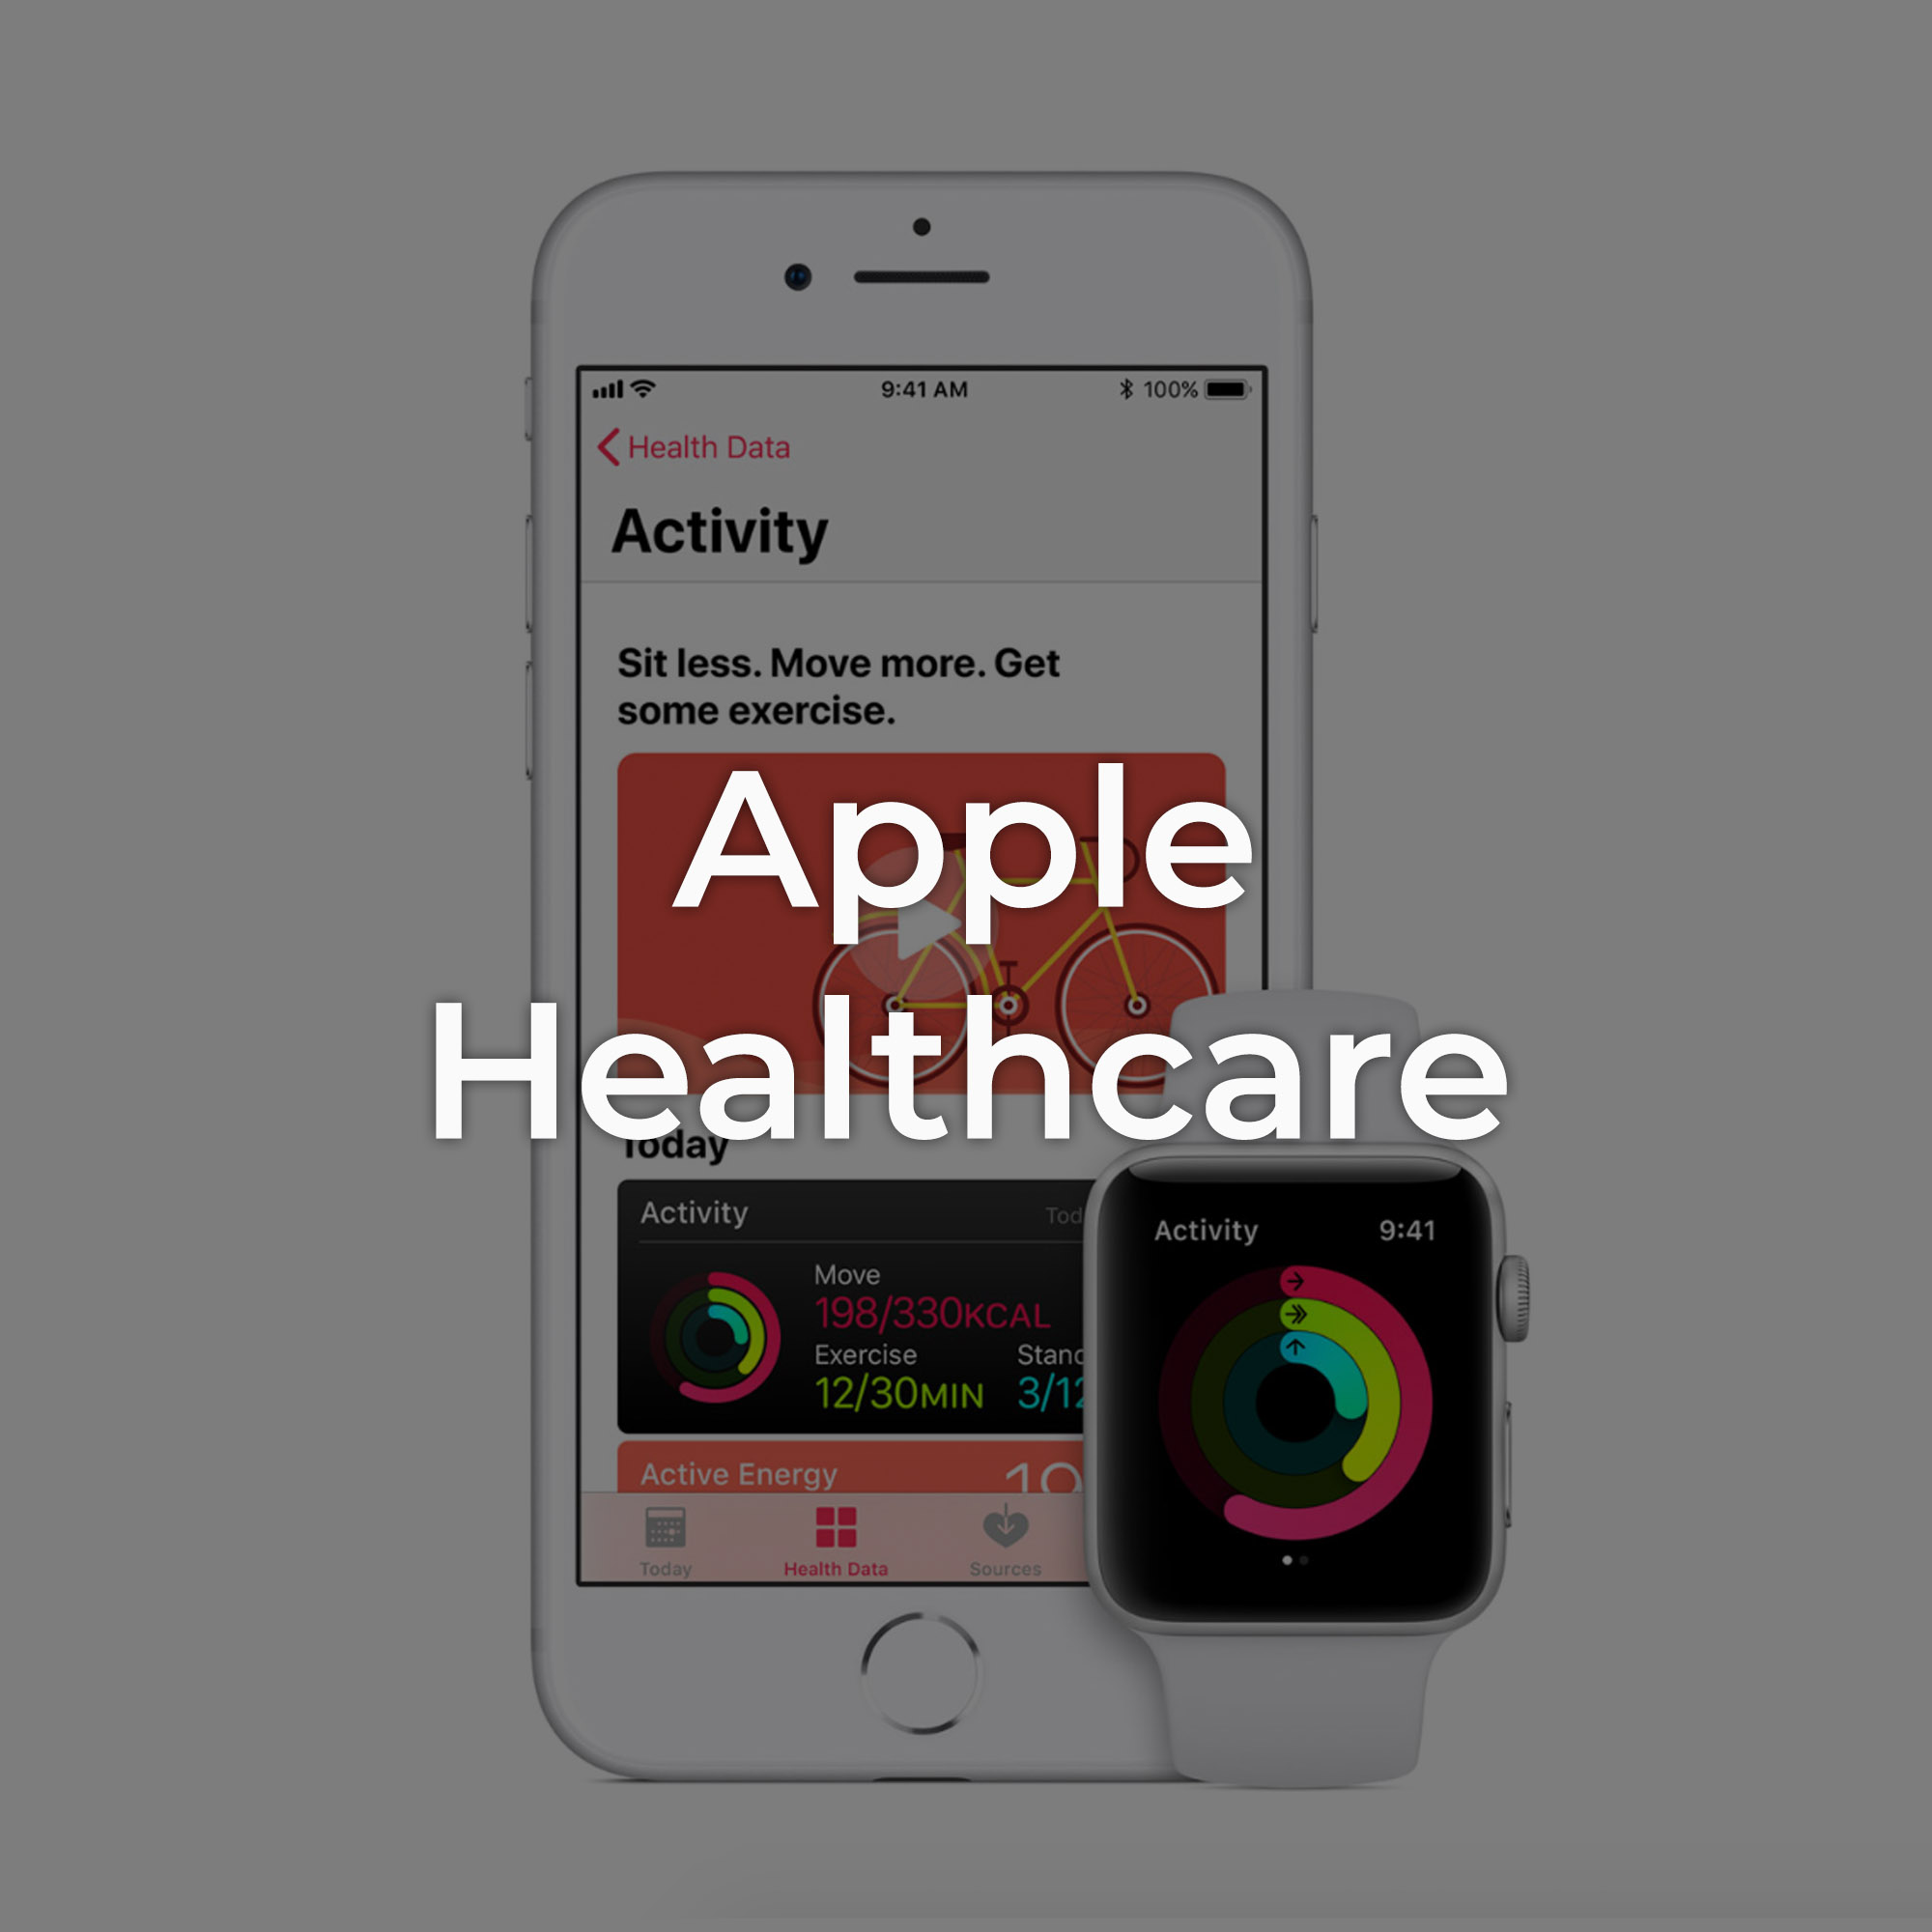 12 apple healthcare.jpg